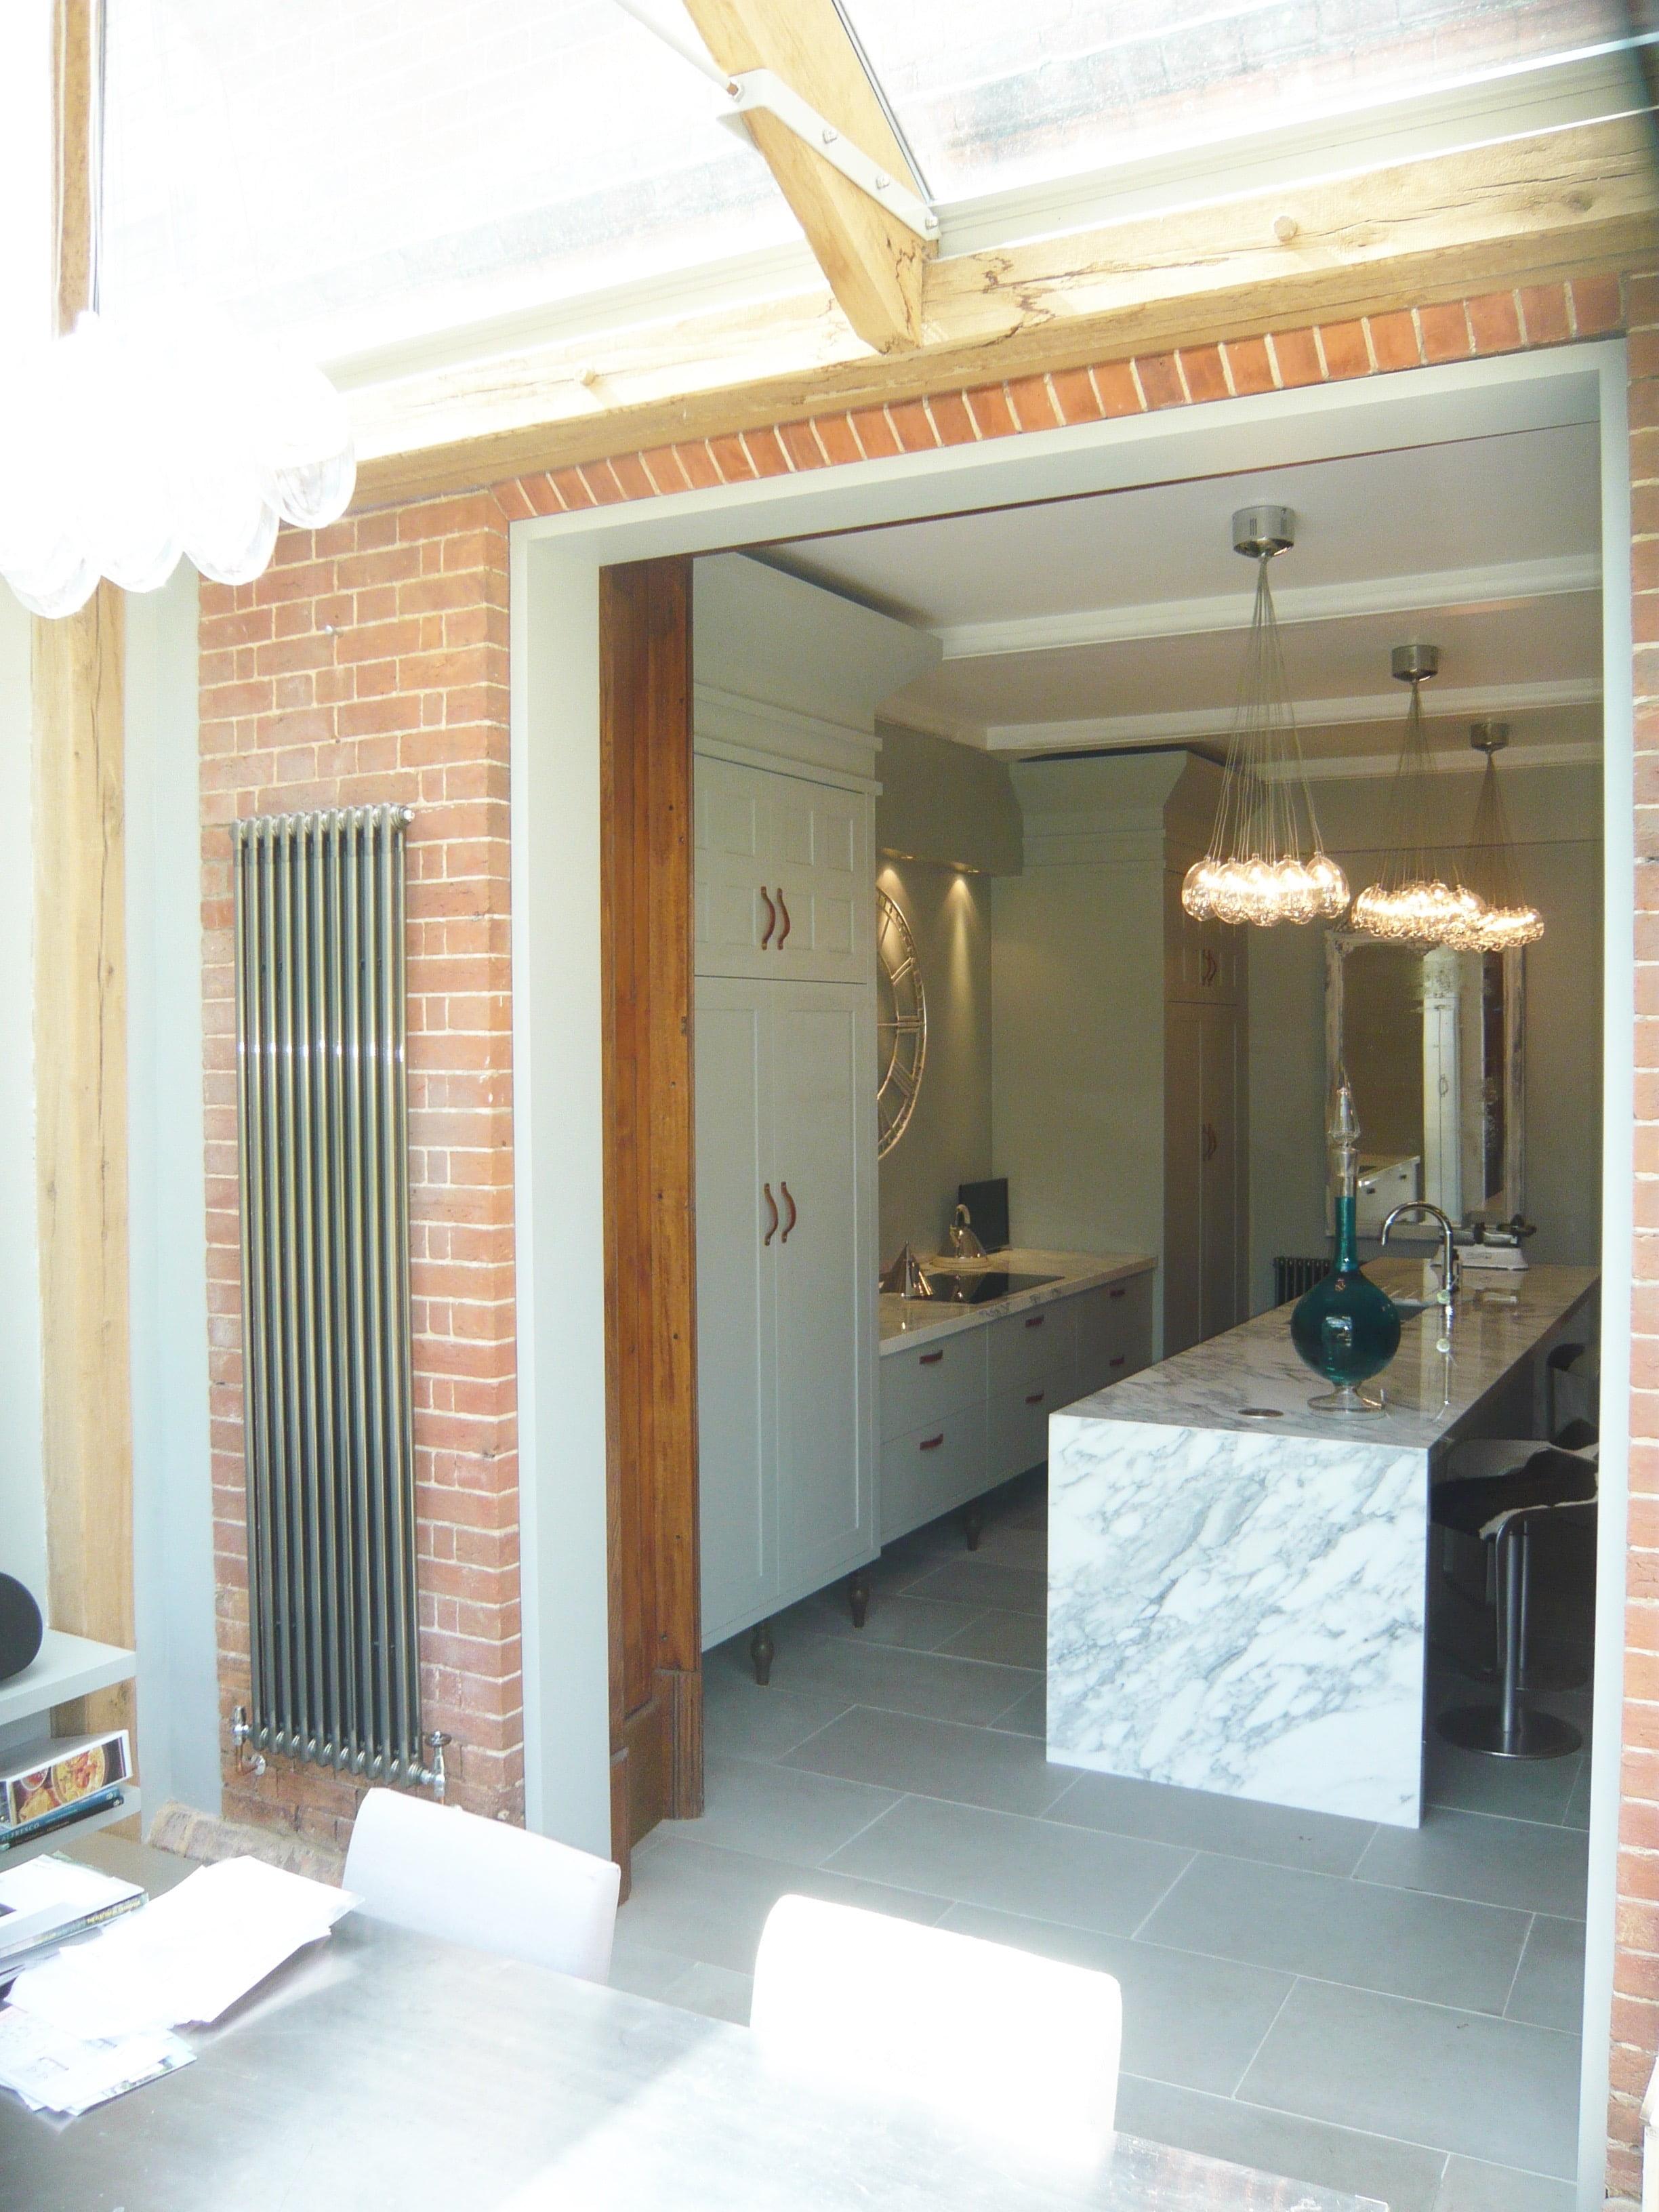 New kitchen in a Victorian house by Jo Alderson Design